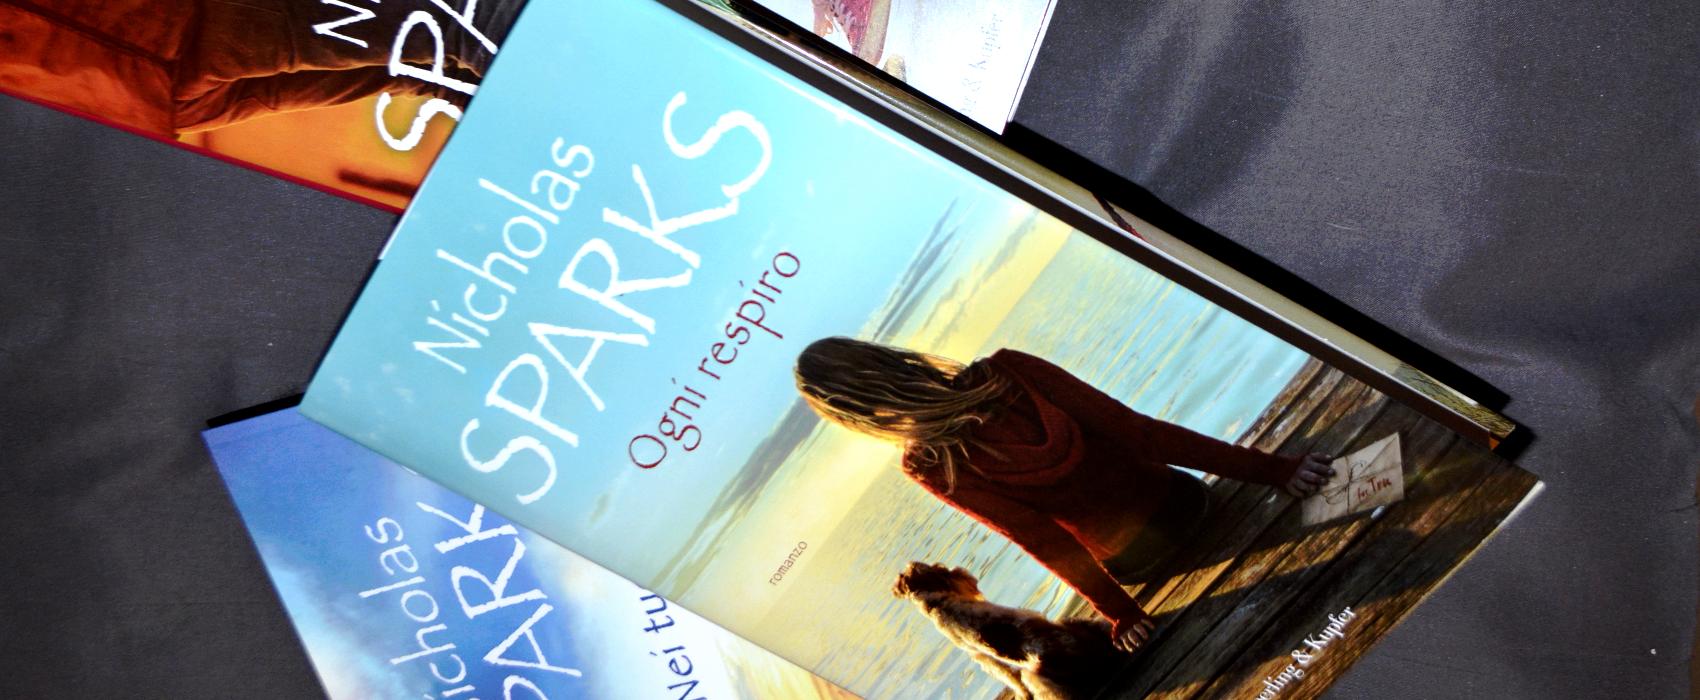 Frasi Matrimonio Nicholas Sparks.Ogni Respiro Nicholas Sparks 50 Mila Pagine